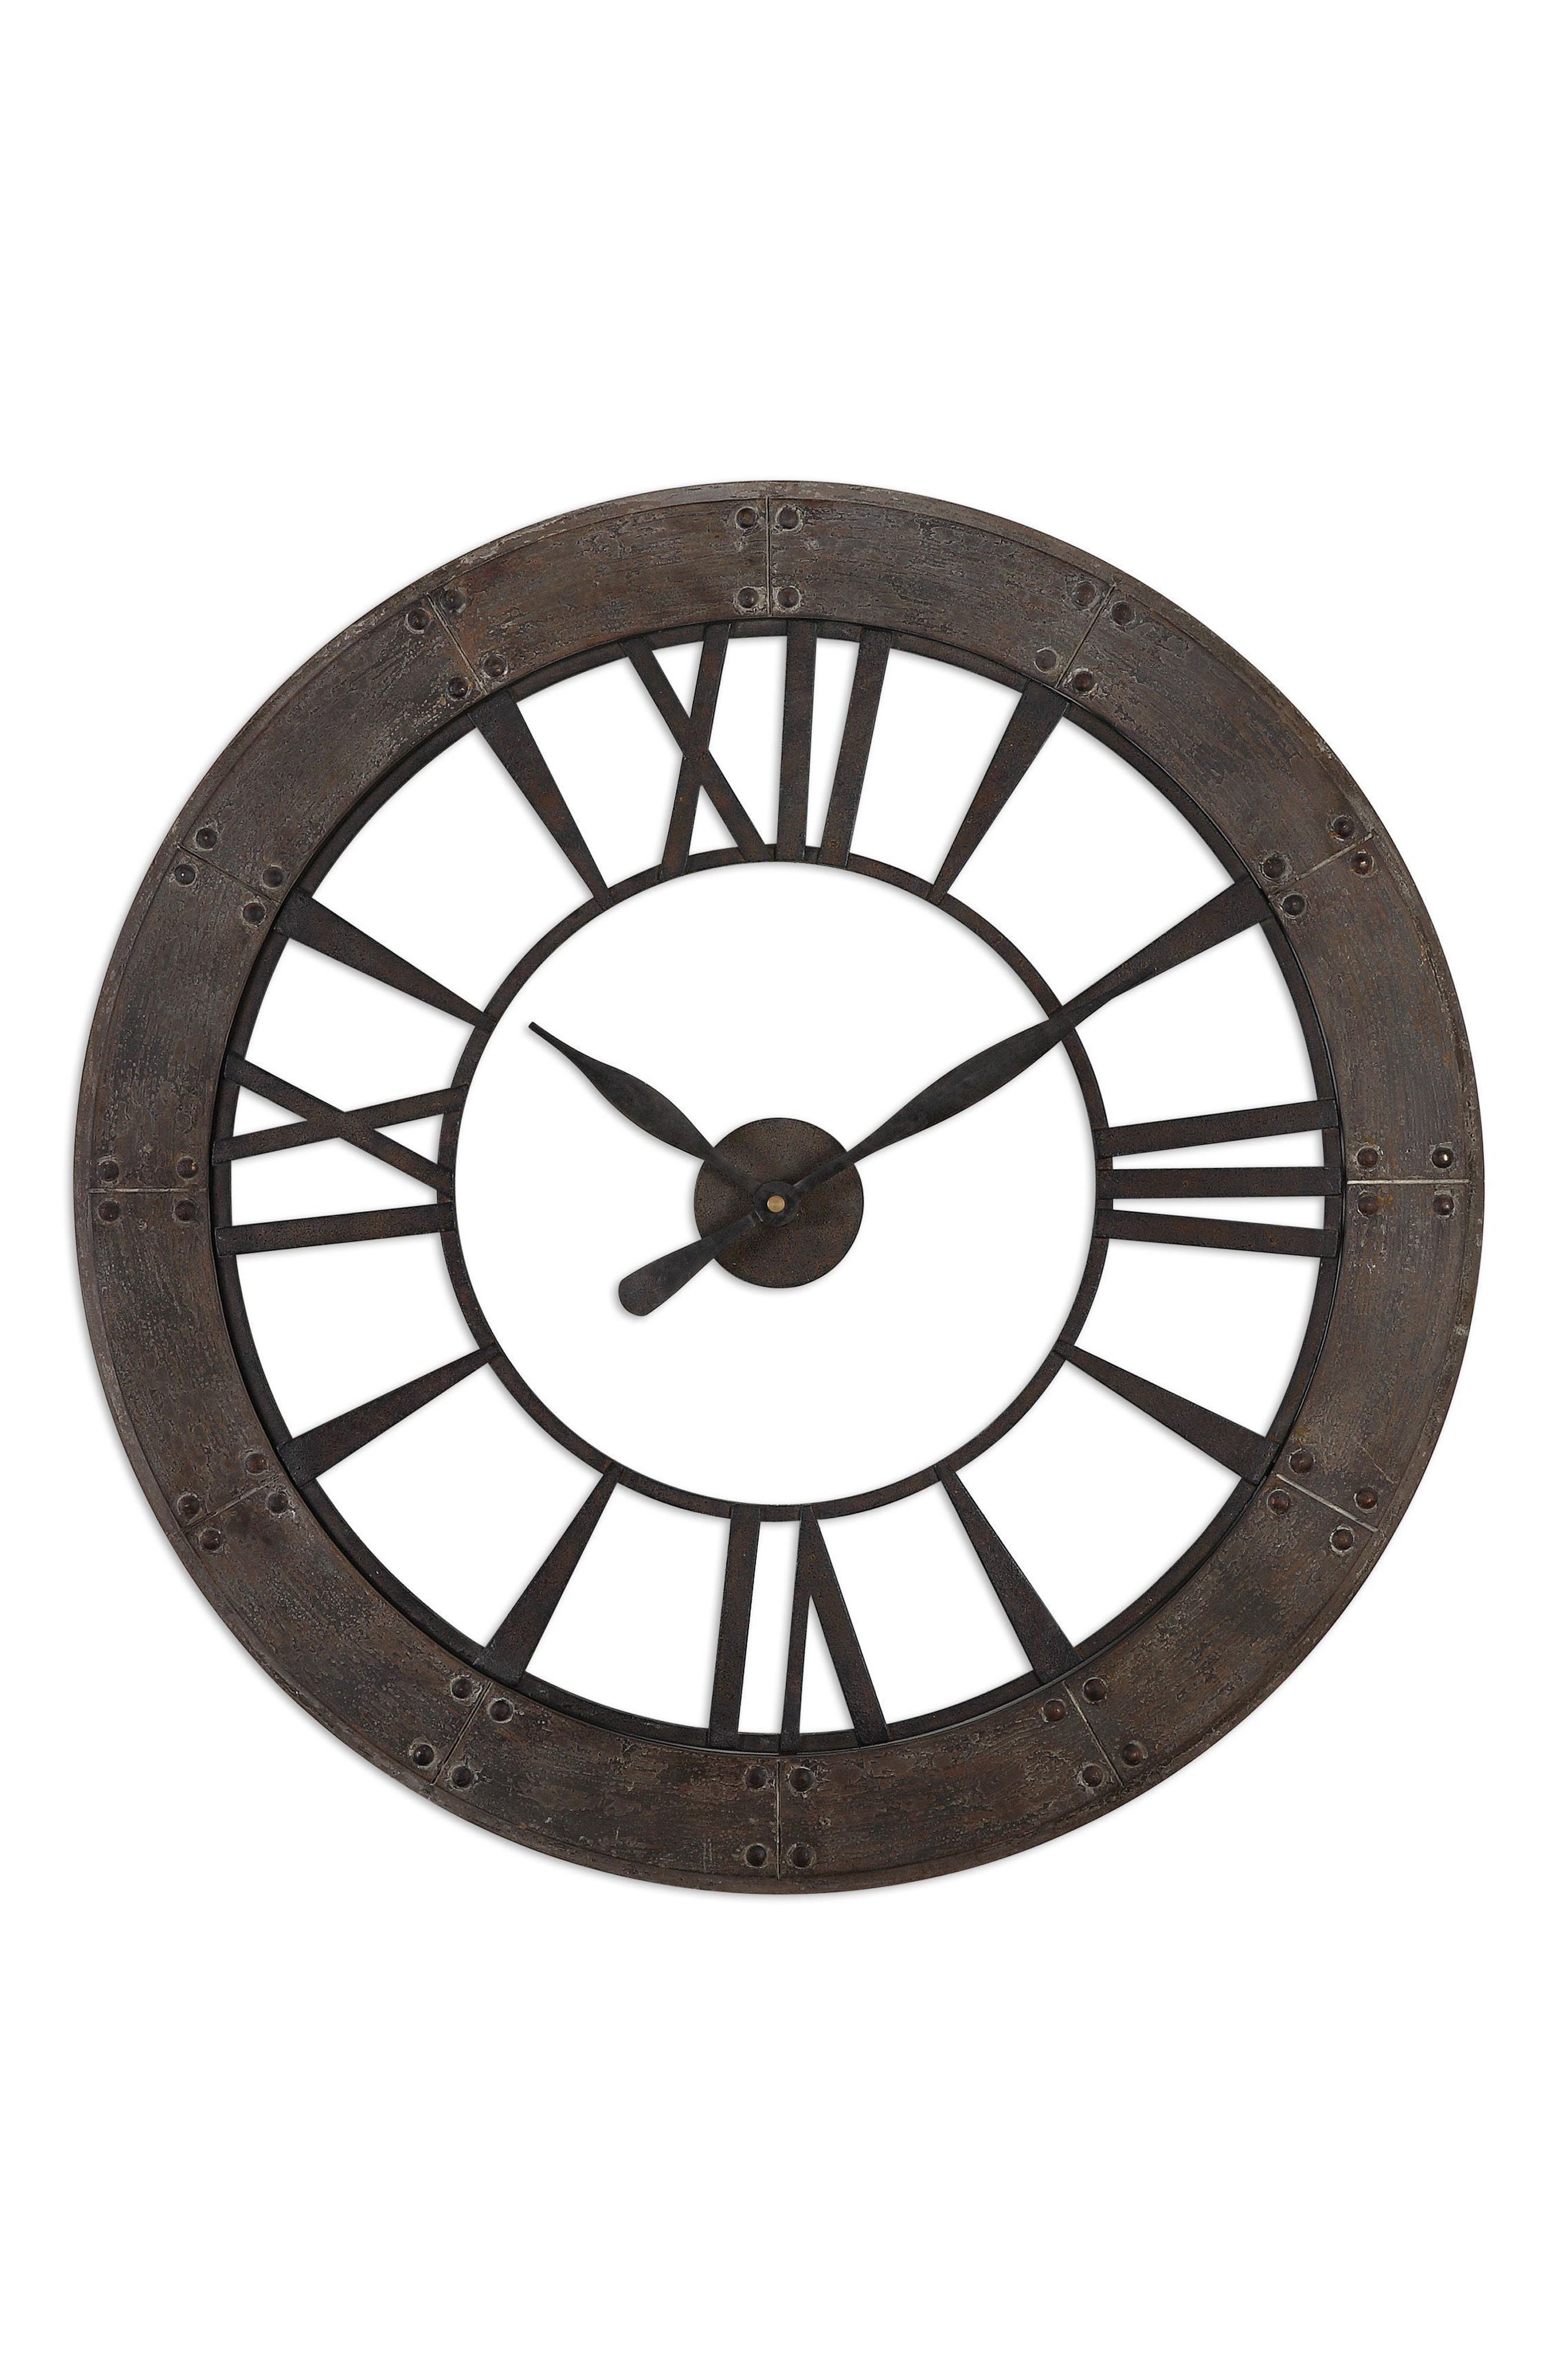 Main Image - Uttermost Ronan Wall Clock